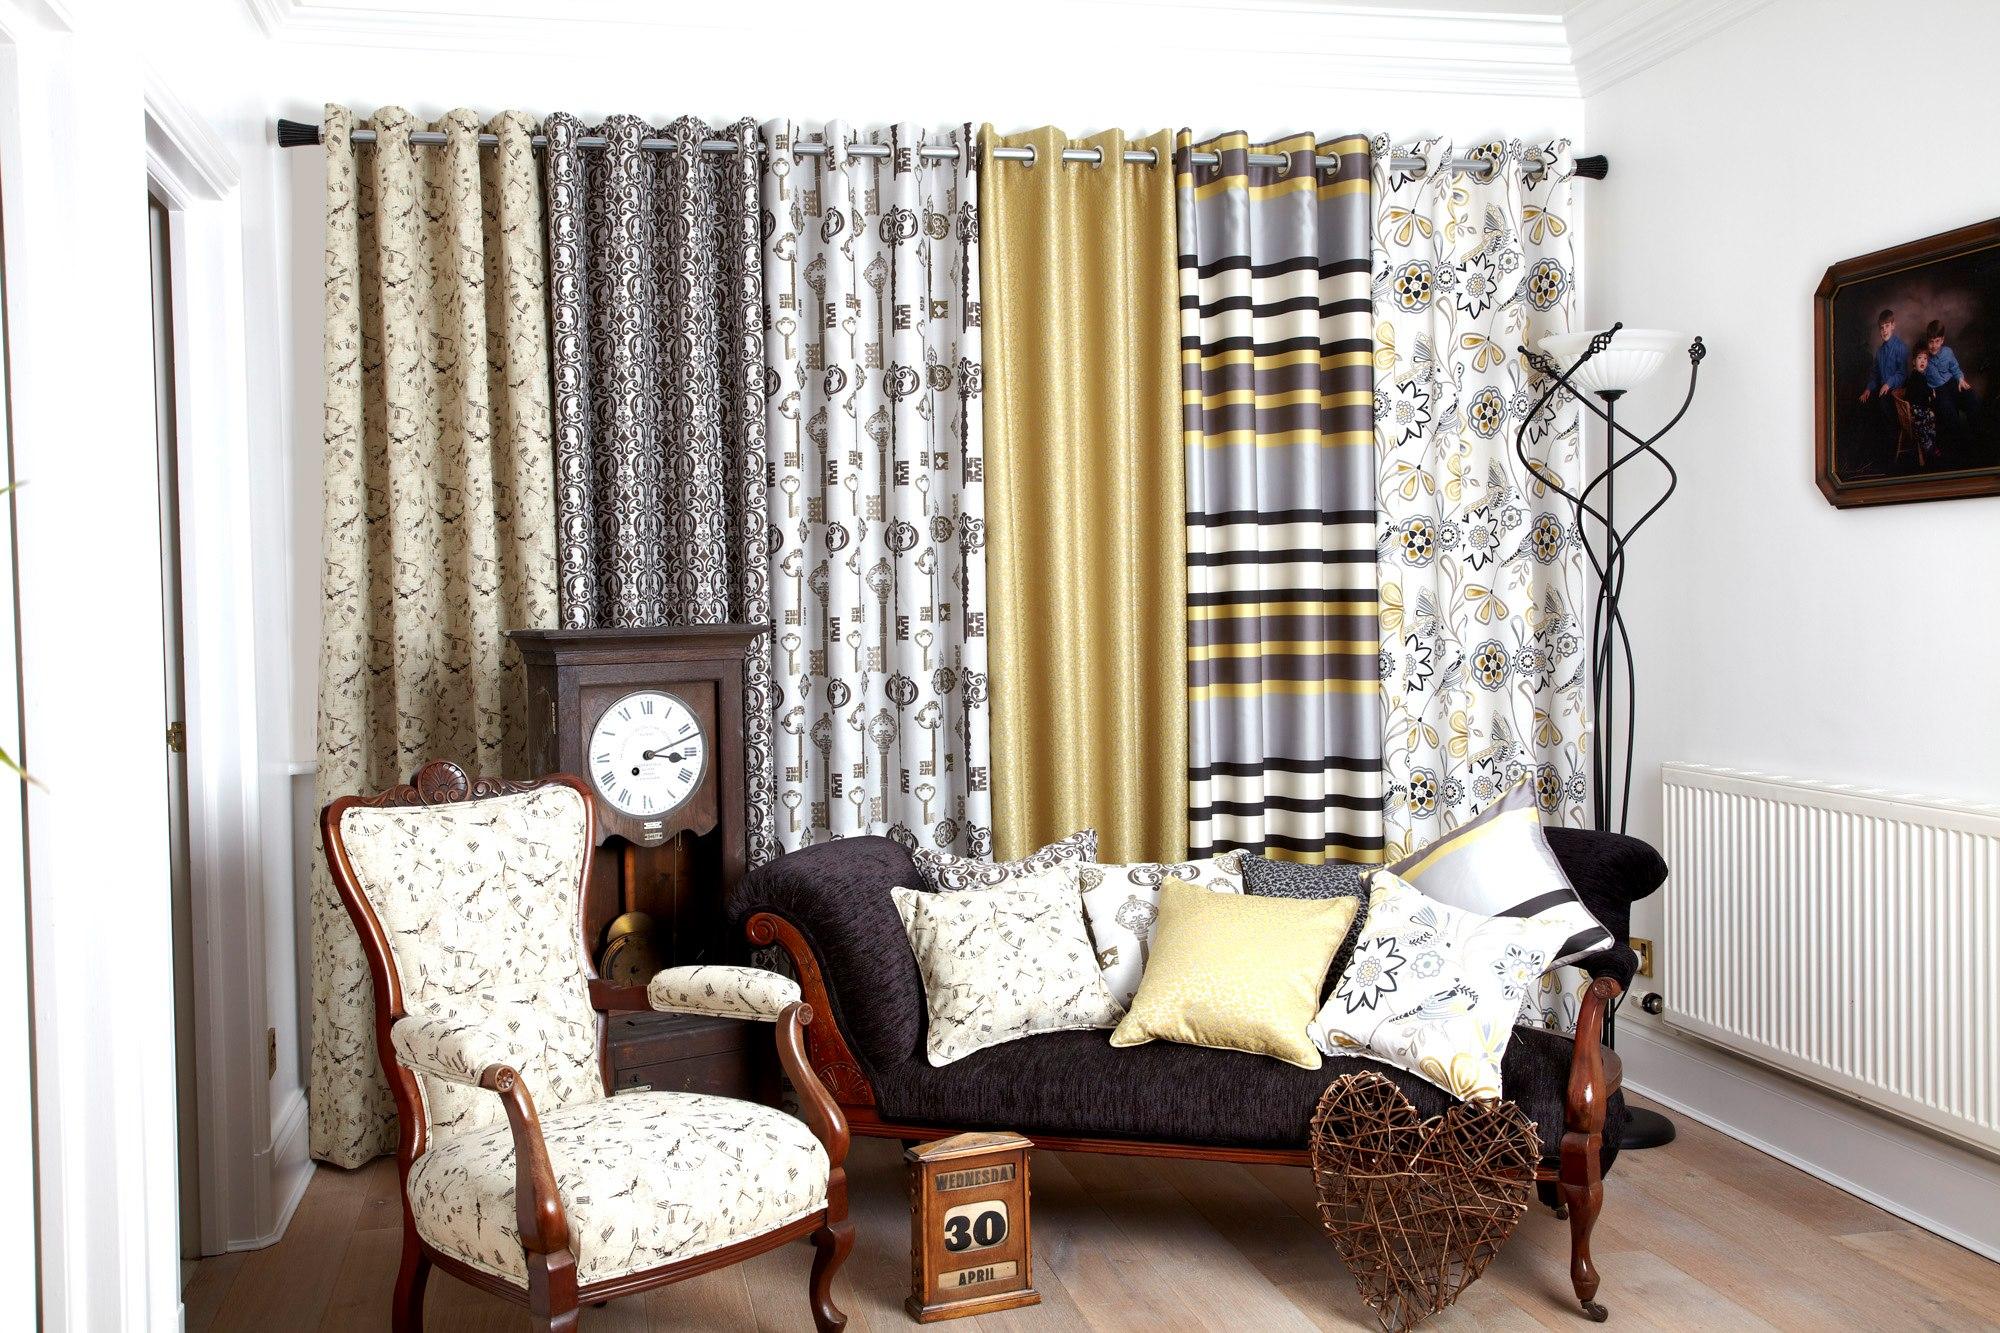 Bill Beaumont Curtains Brands Ledbury Carpets And